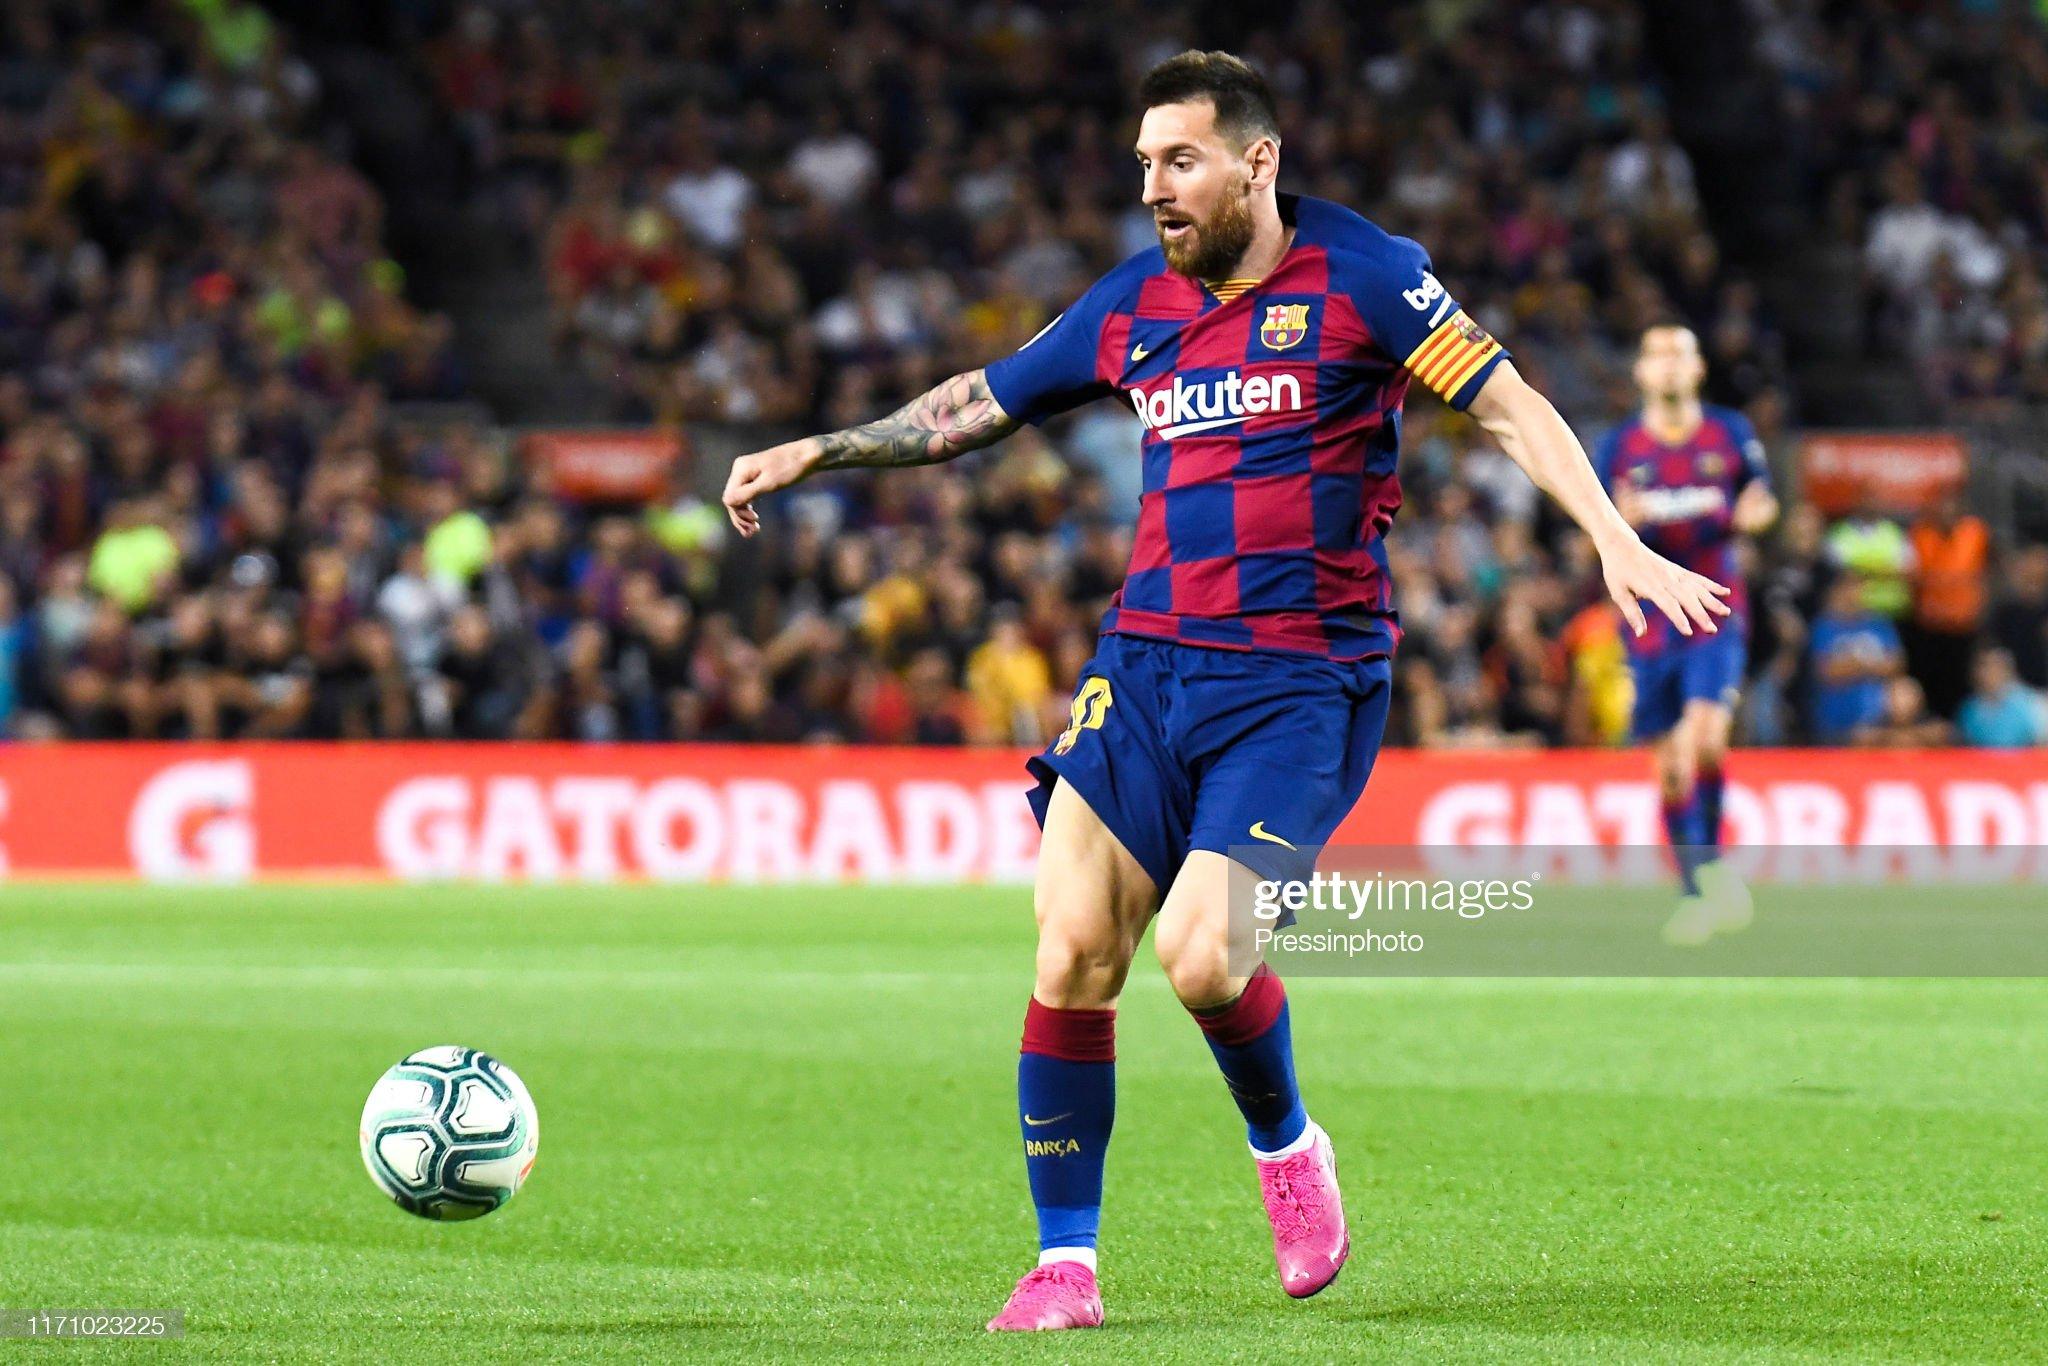 صور مباراة : برشلونة - فياريال 2-1 ( 24-09-2019 )  Lionel-messi-of-fc-barcelona-during-the-liga-match-between-barcelona-picture-id1171023225?s=2048x2048